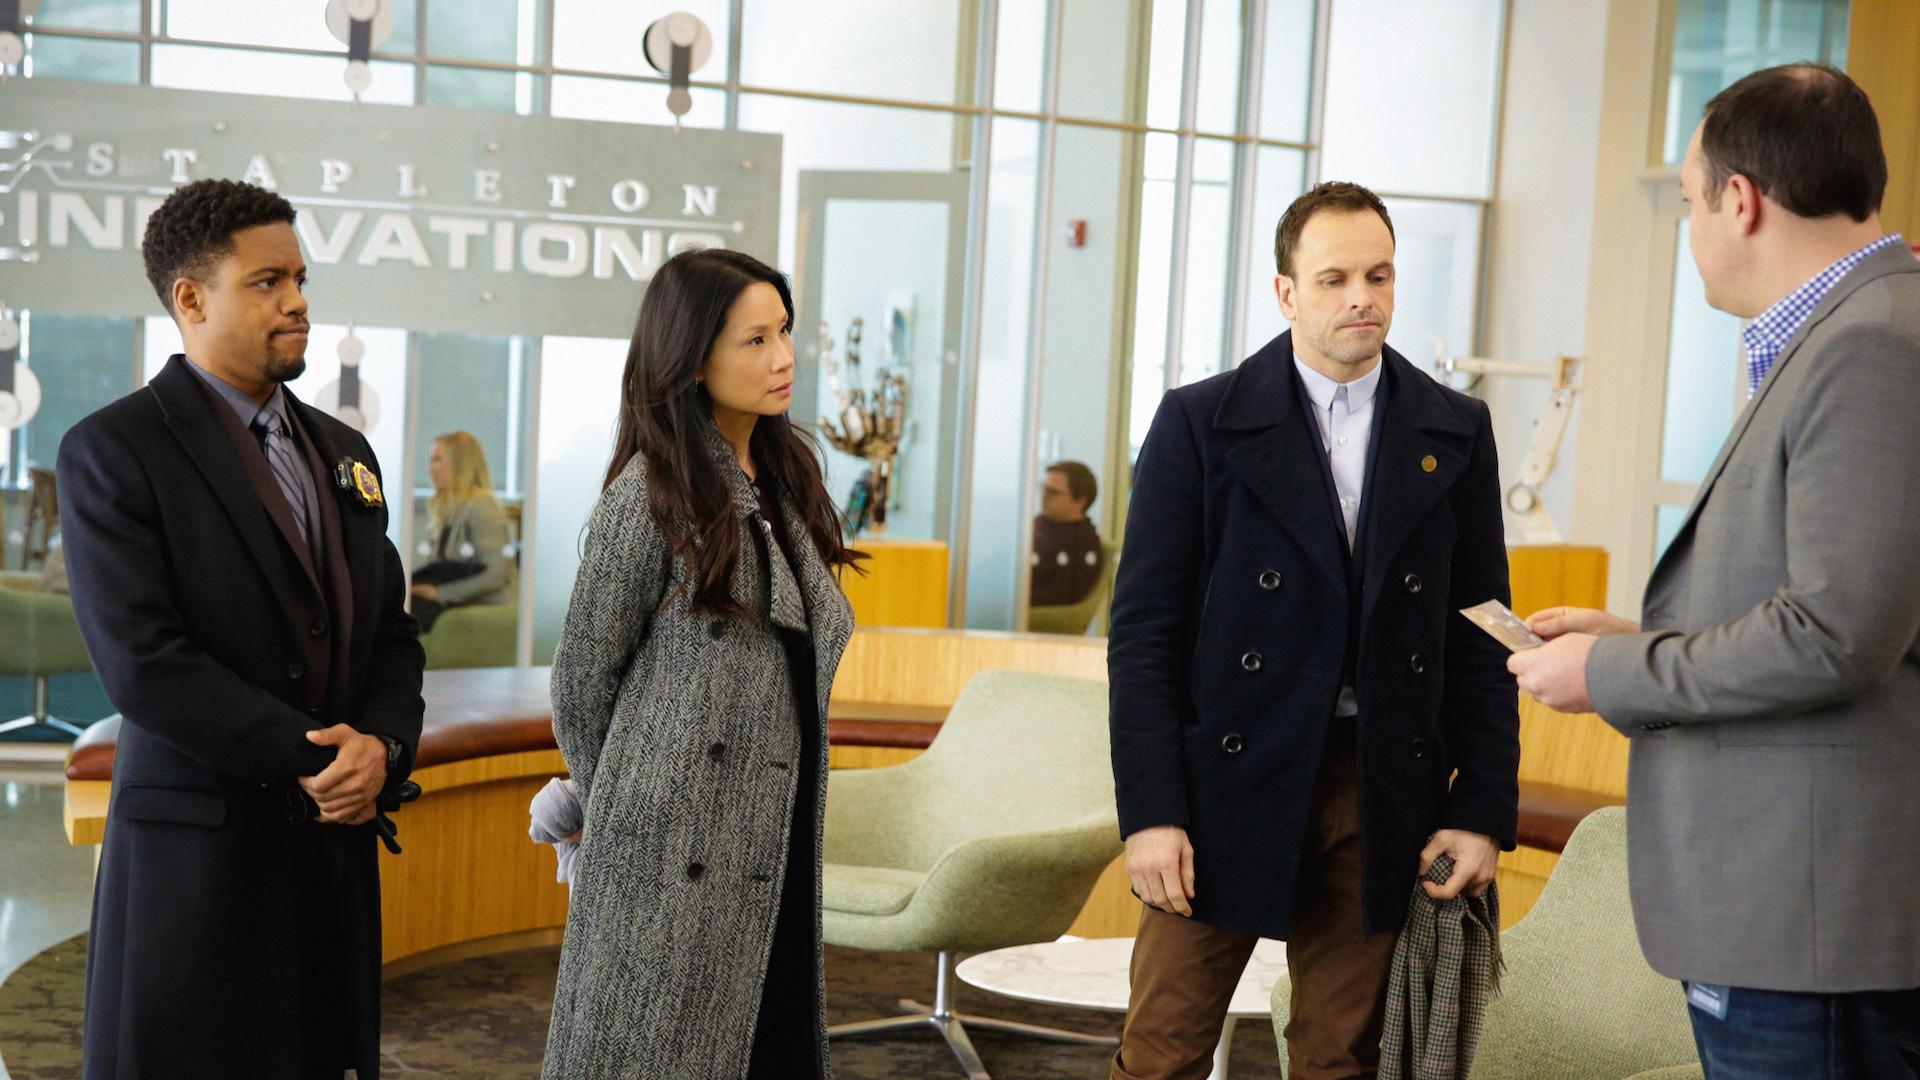 Jon Michael Hill as Detective Marcus Bell, Lucy Liu as Joan Watson and Jonny Lee Miller as Sherlock Holmes